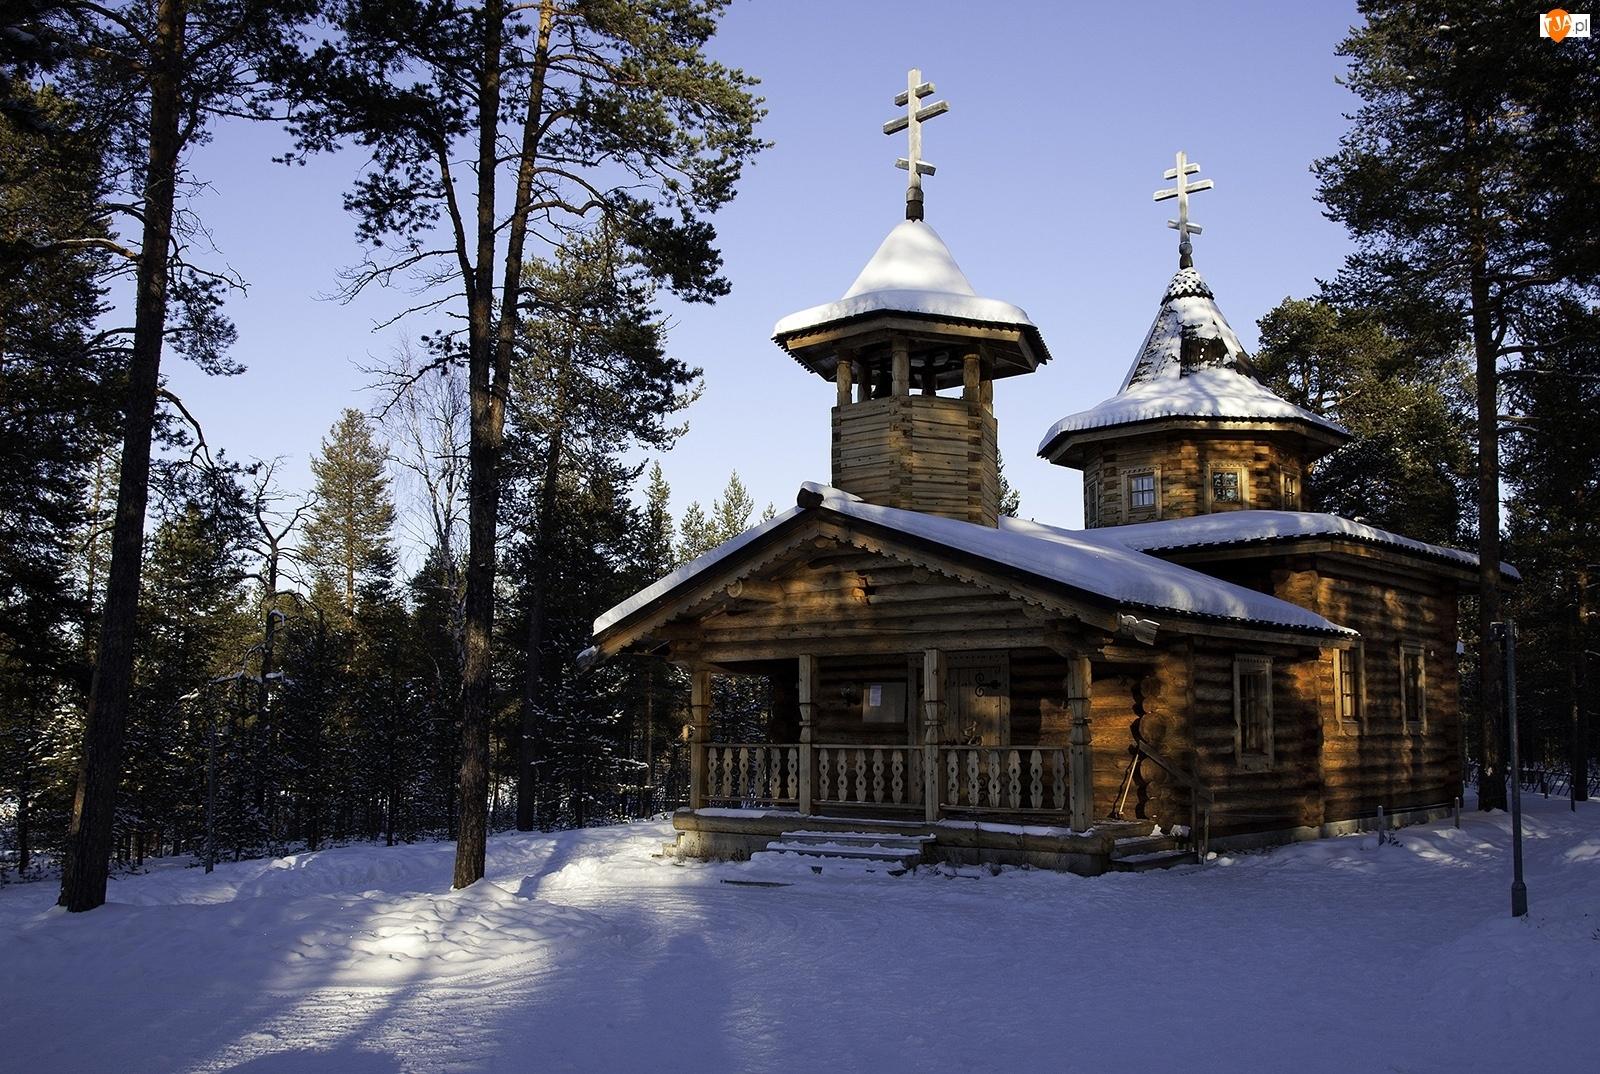 Zima, Cerkiew, Śnieg, Las